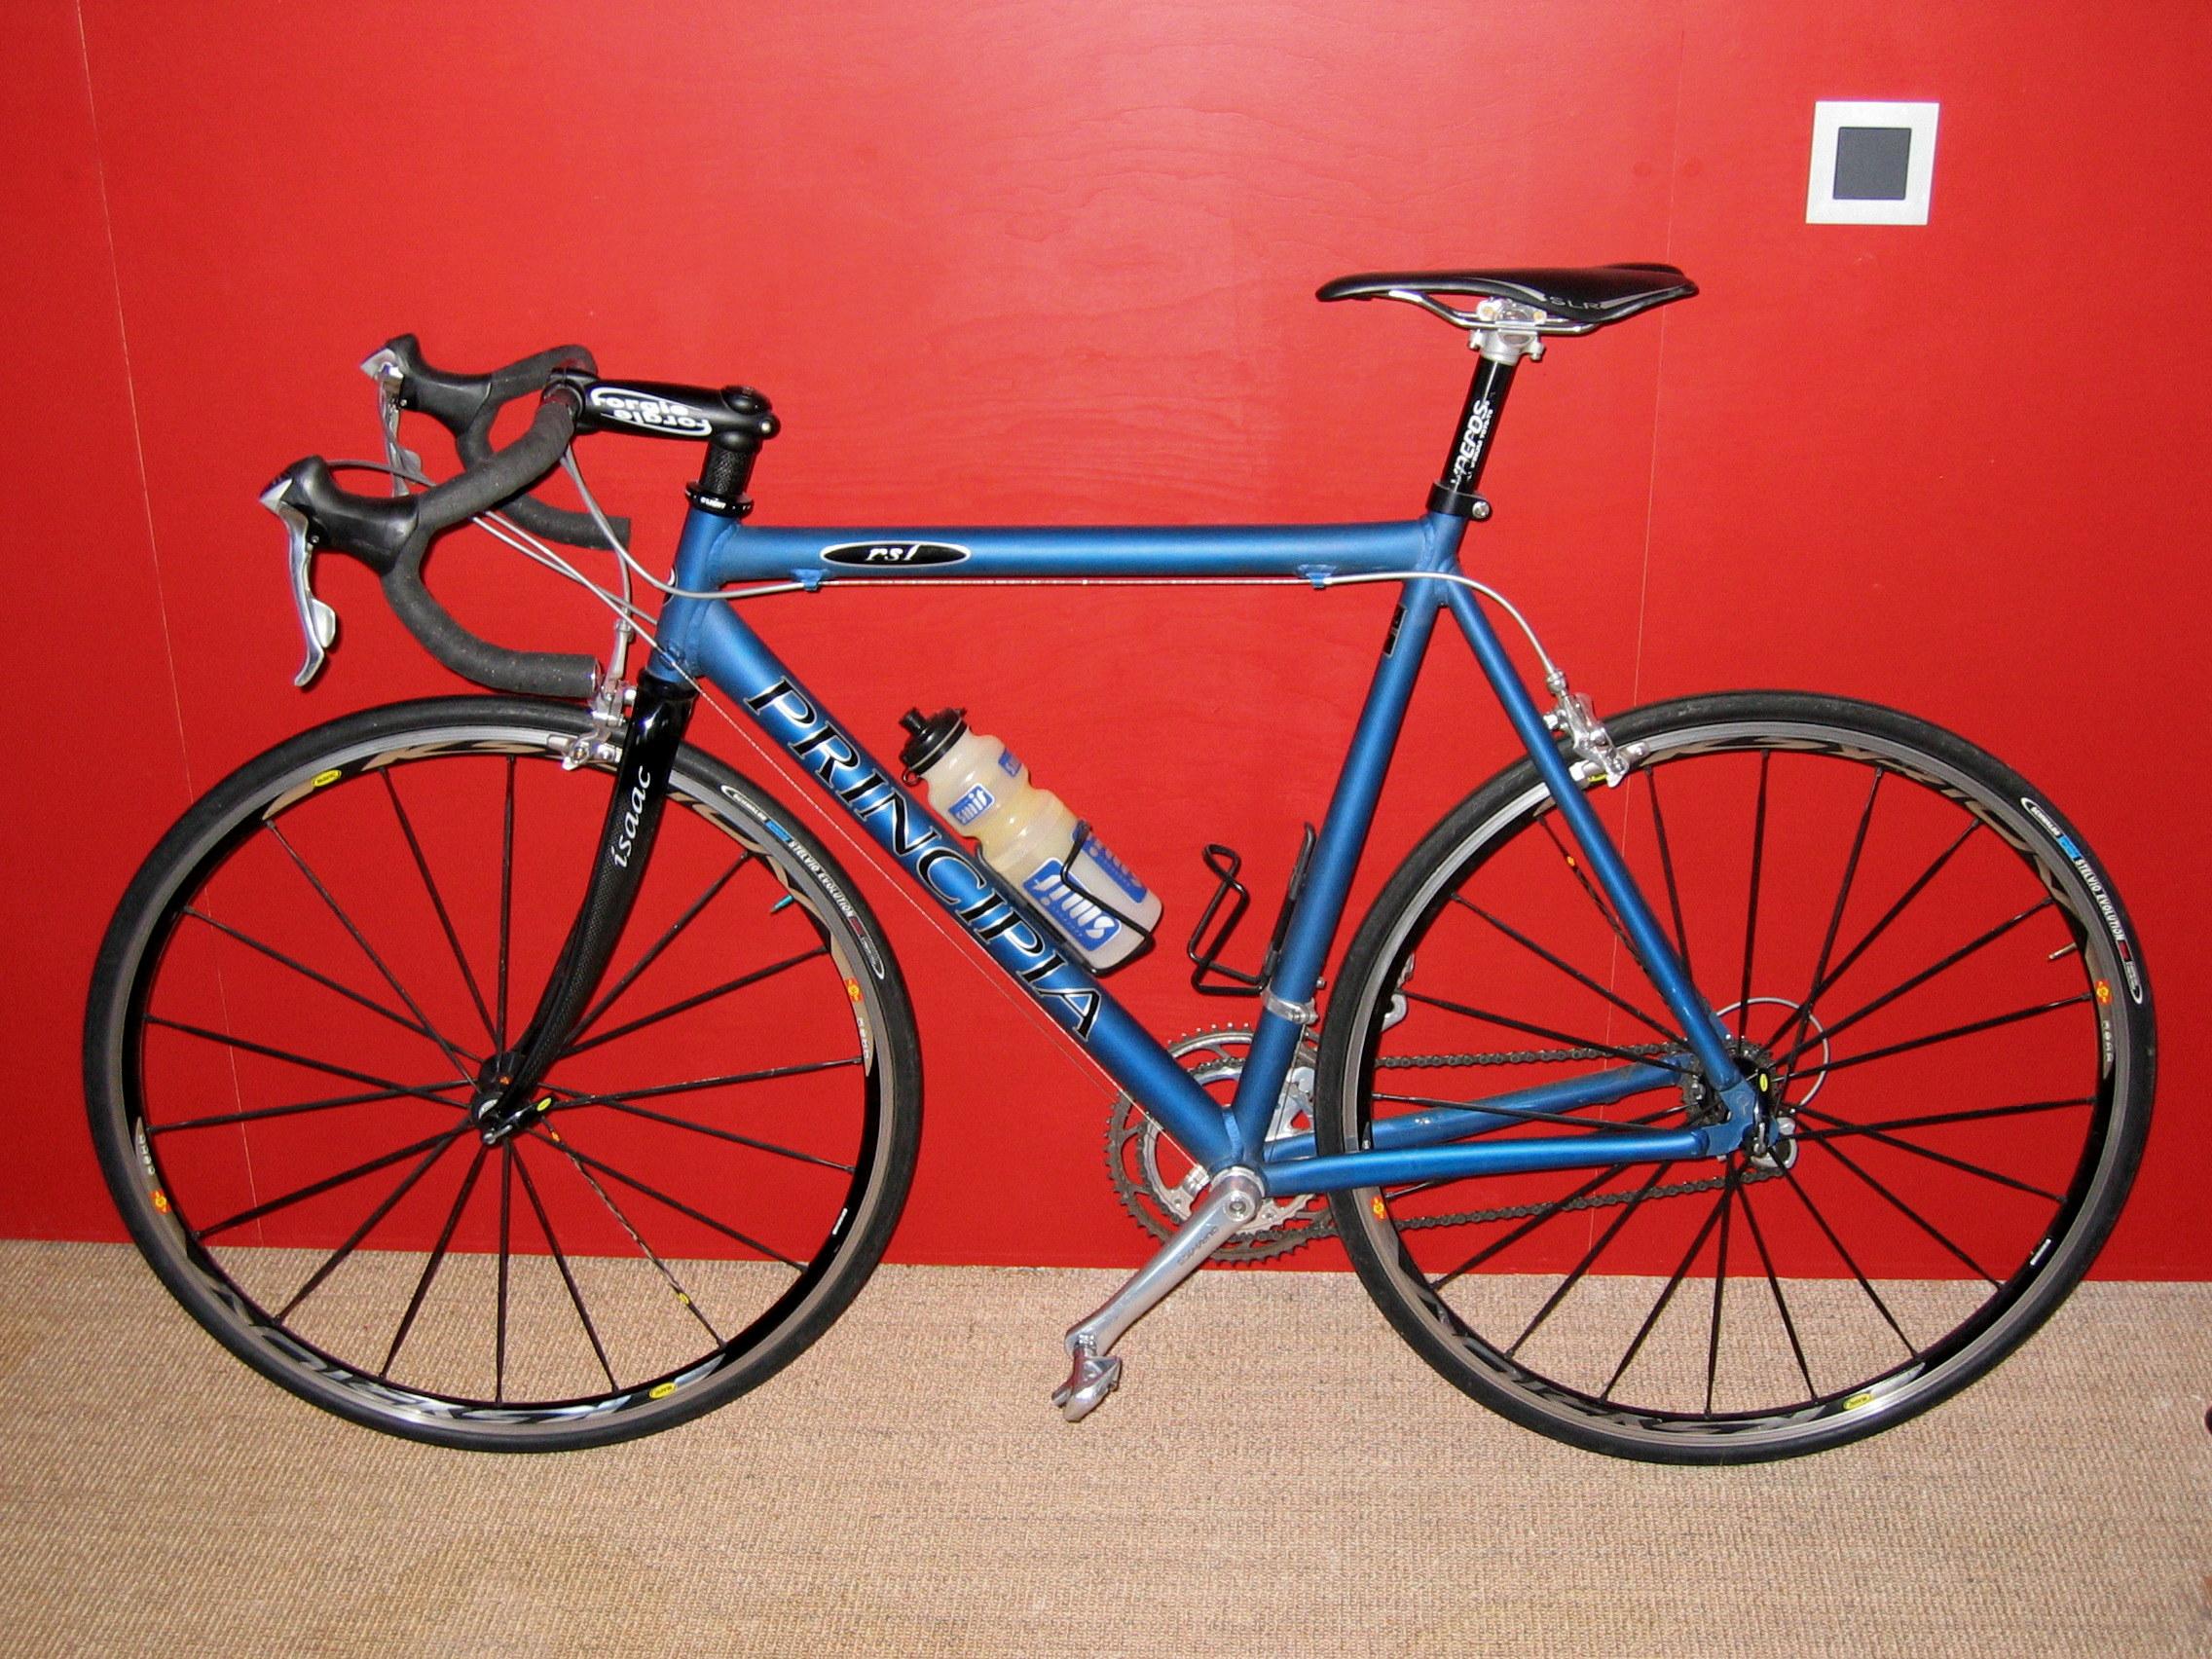 24.02.04_2 Fahrrad - Kopie.JPG